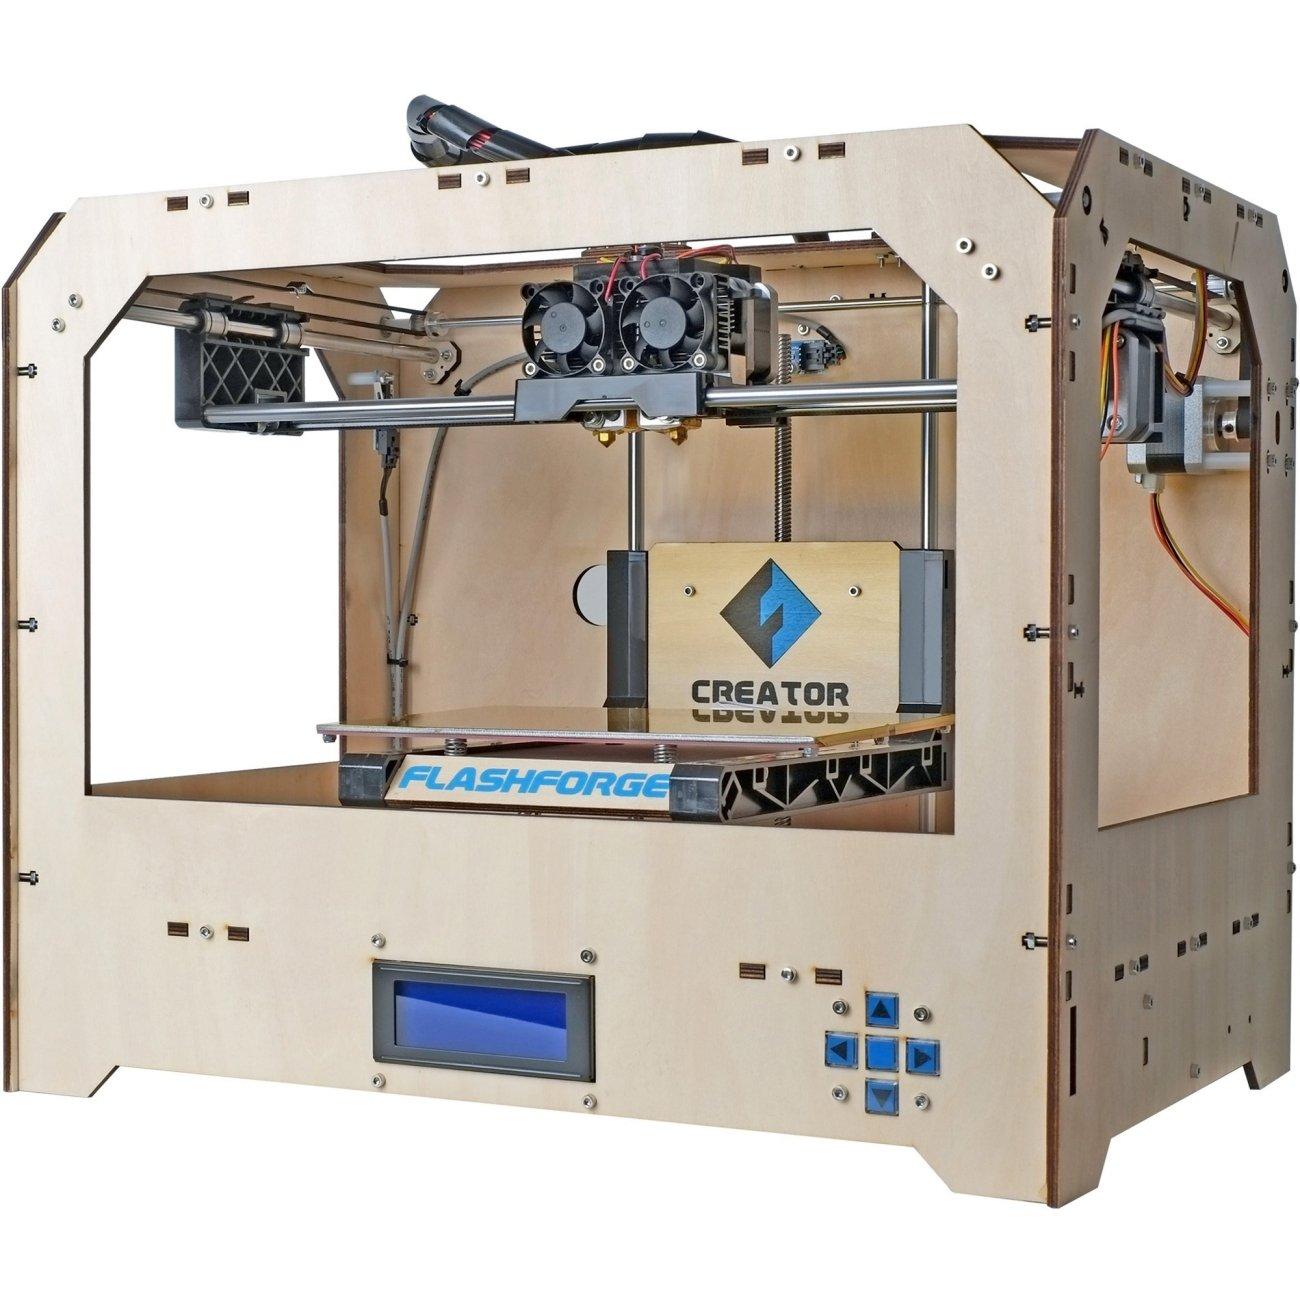 FlashForge 3d-ffg-crewo Creador Funda de madera 3d impresora ...